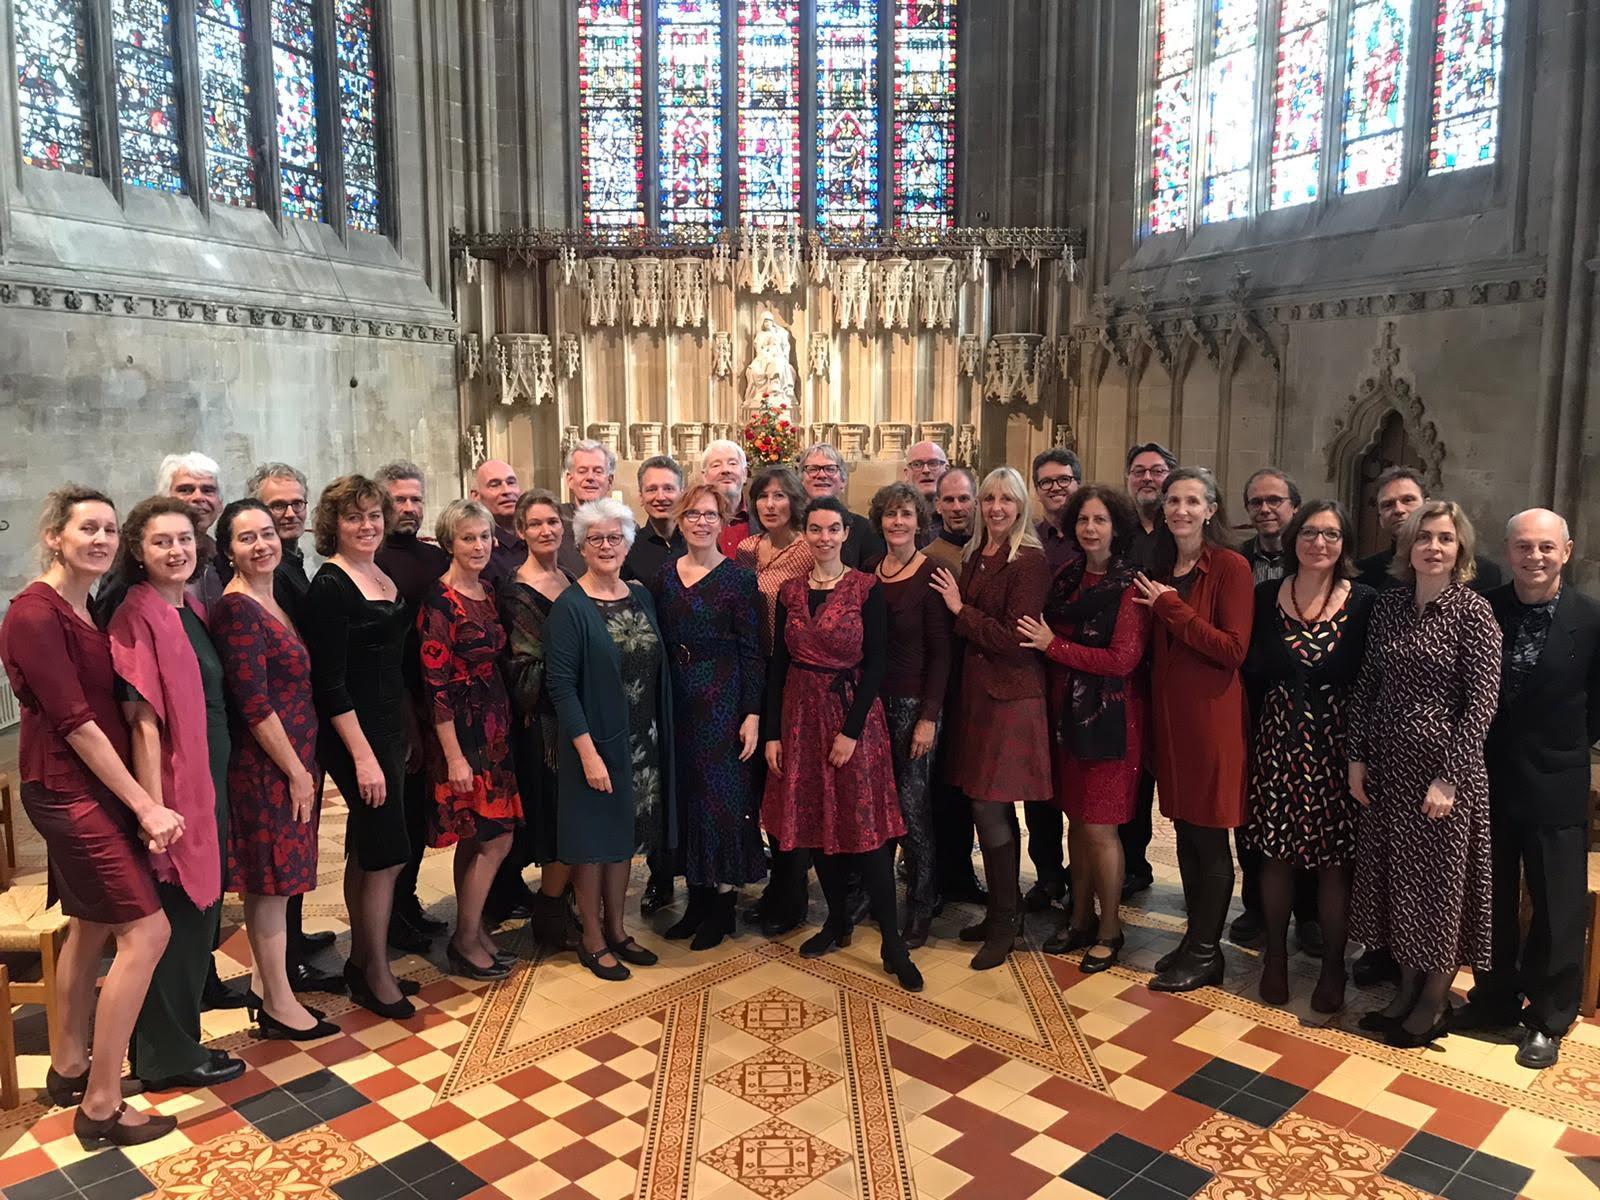 Sweelinck Chamber Choir 2019